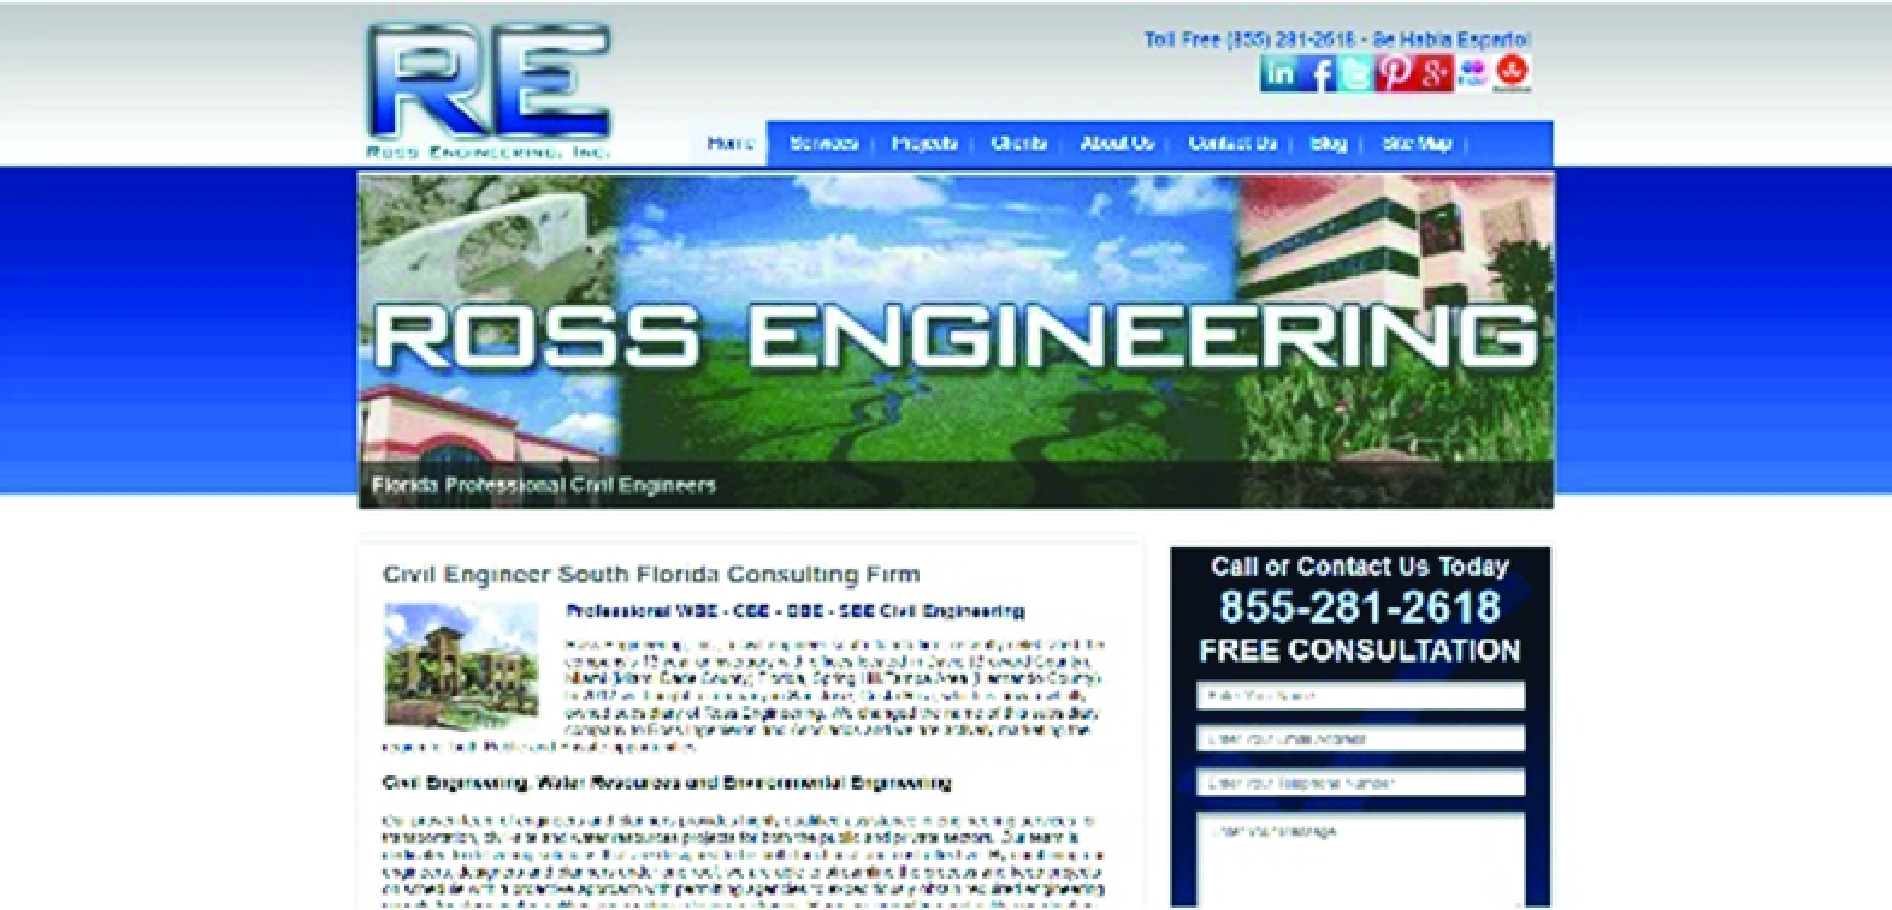 Blog Post Image 2.jpg